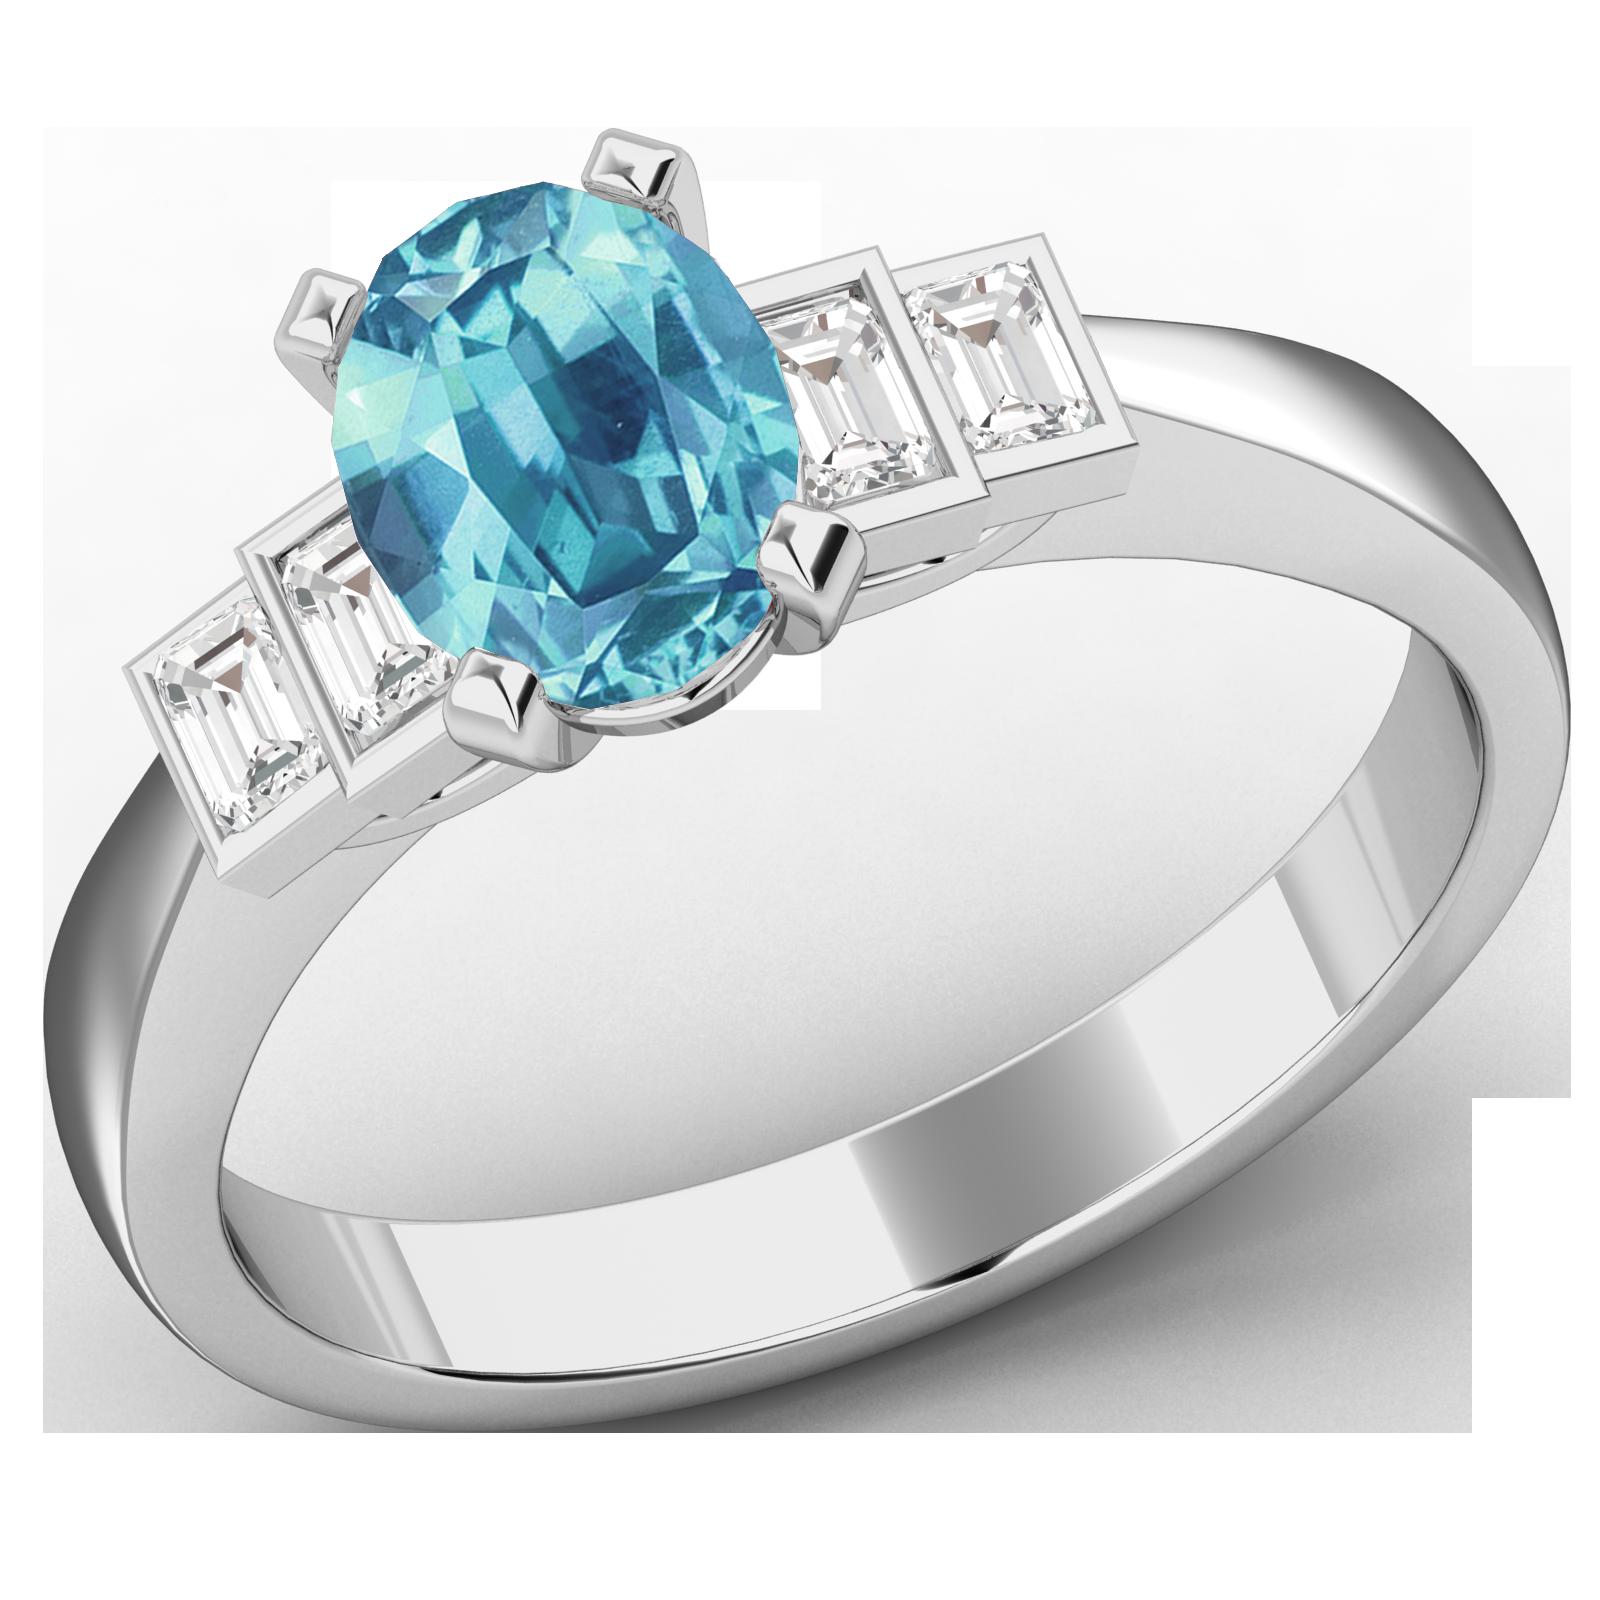 RDAQ718W-Inel cu Acvamarin si Diamante Dama Aur Alb 18kt cu 4 Diamante, cu un Acvamarin Central Oval si Diamante Forma Bagheta pe Margini-img1